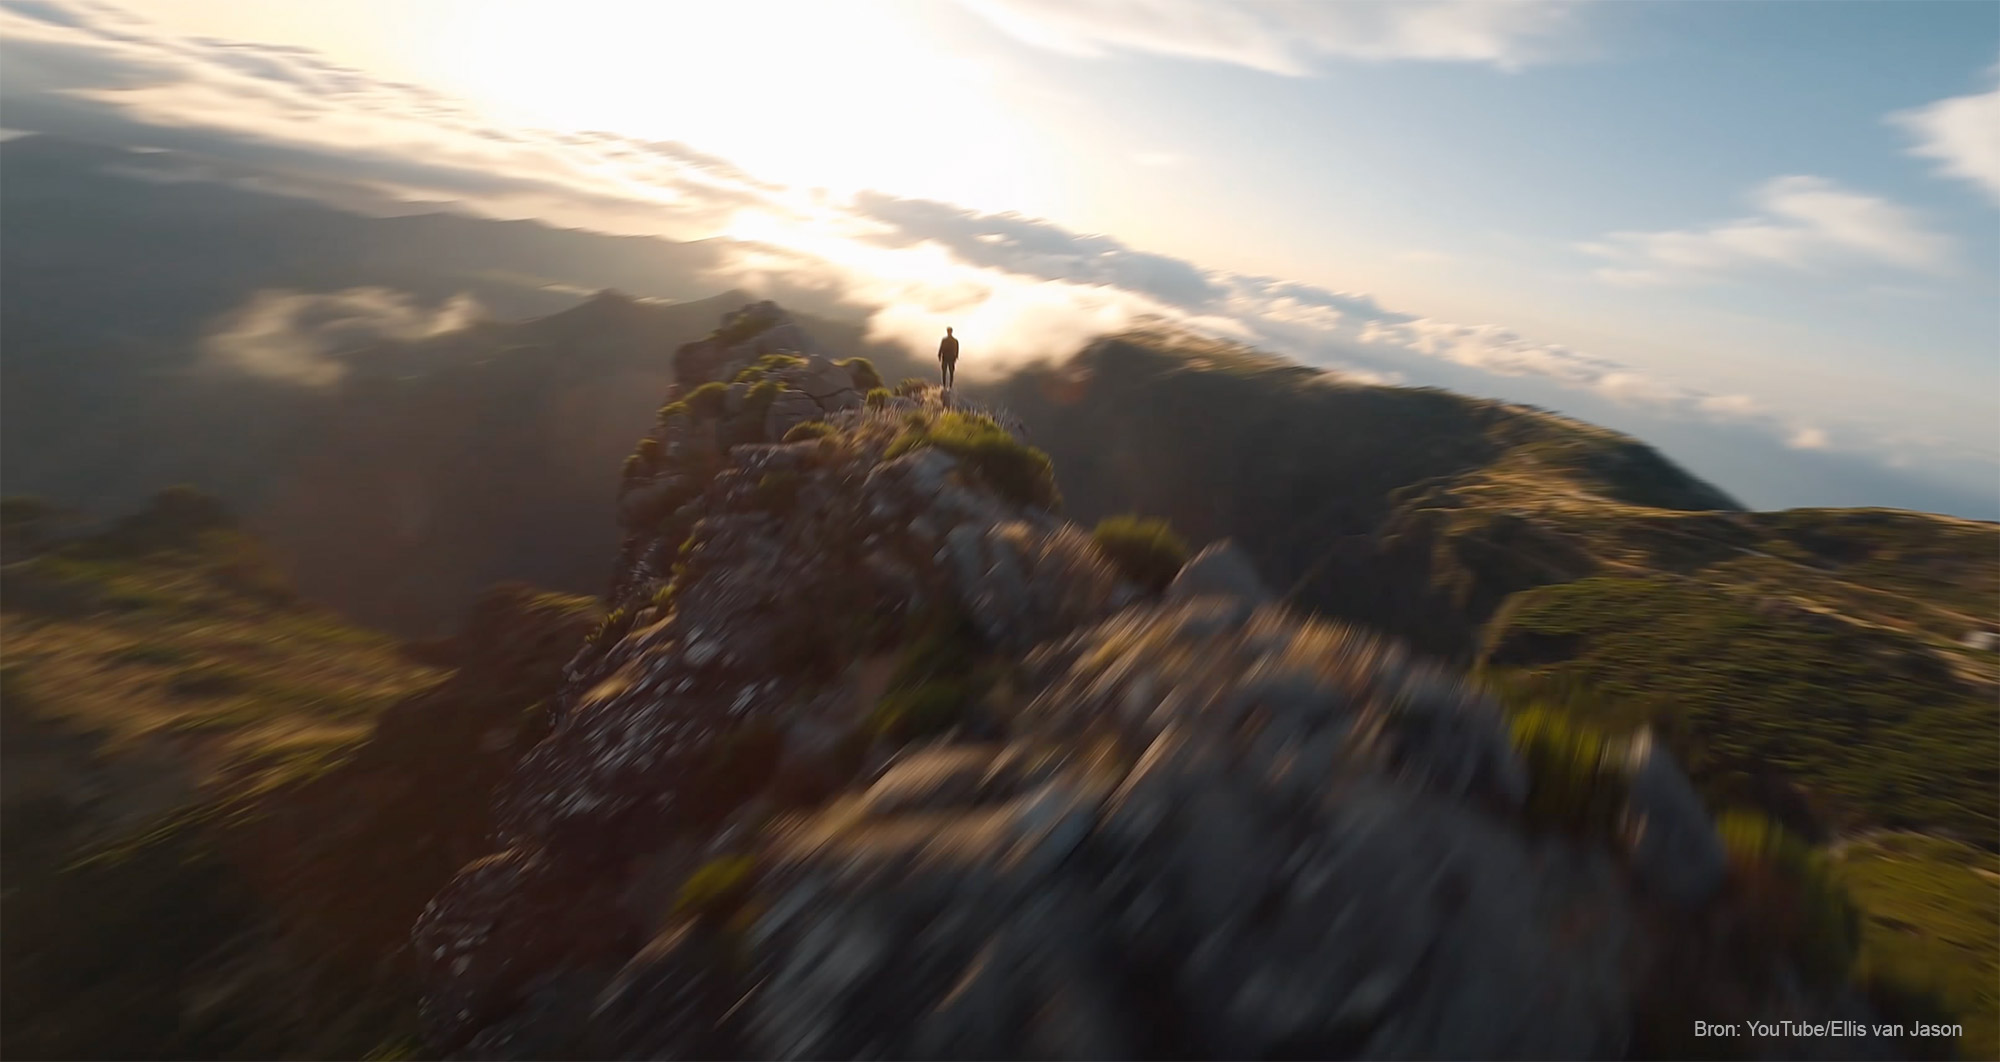 Kijken: Madeira FPV, de hoofdprijswinnende dronevideo bij SkyPixel | Dronewatch